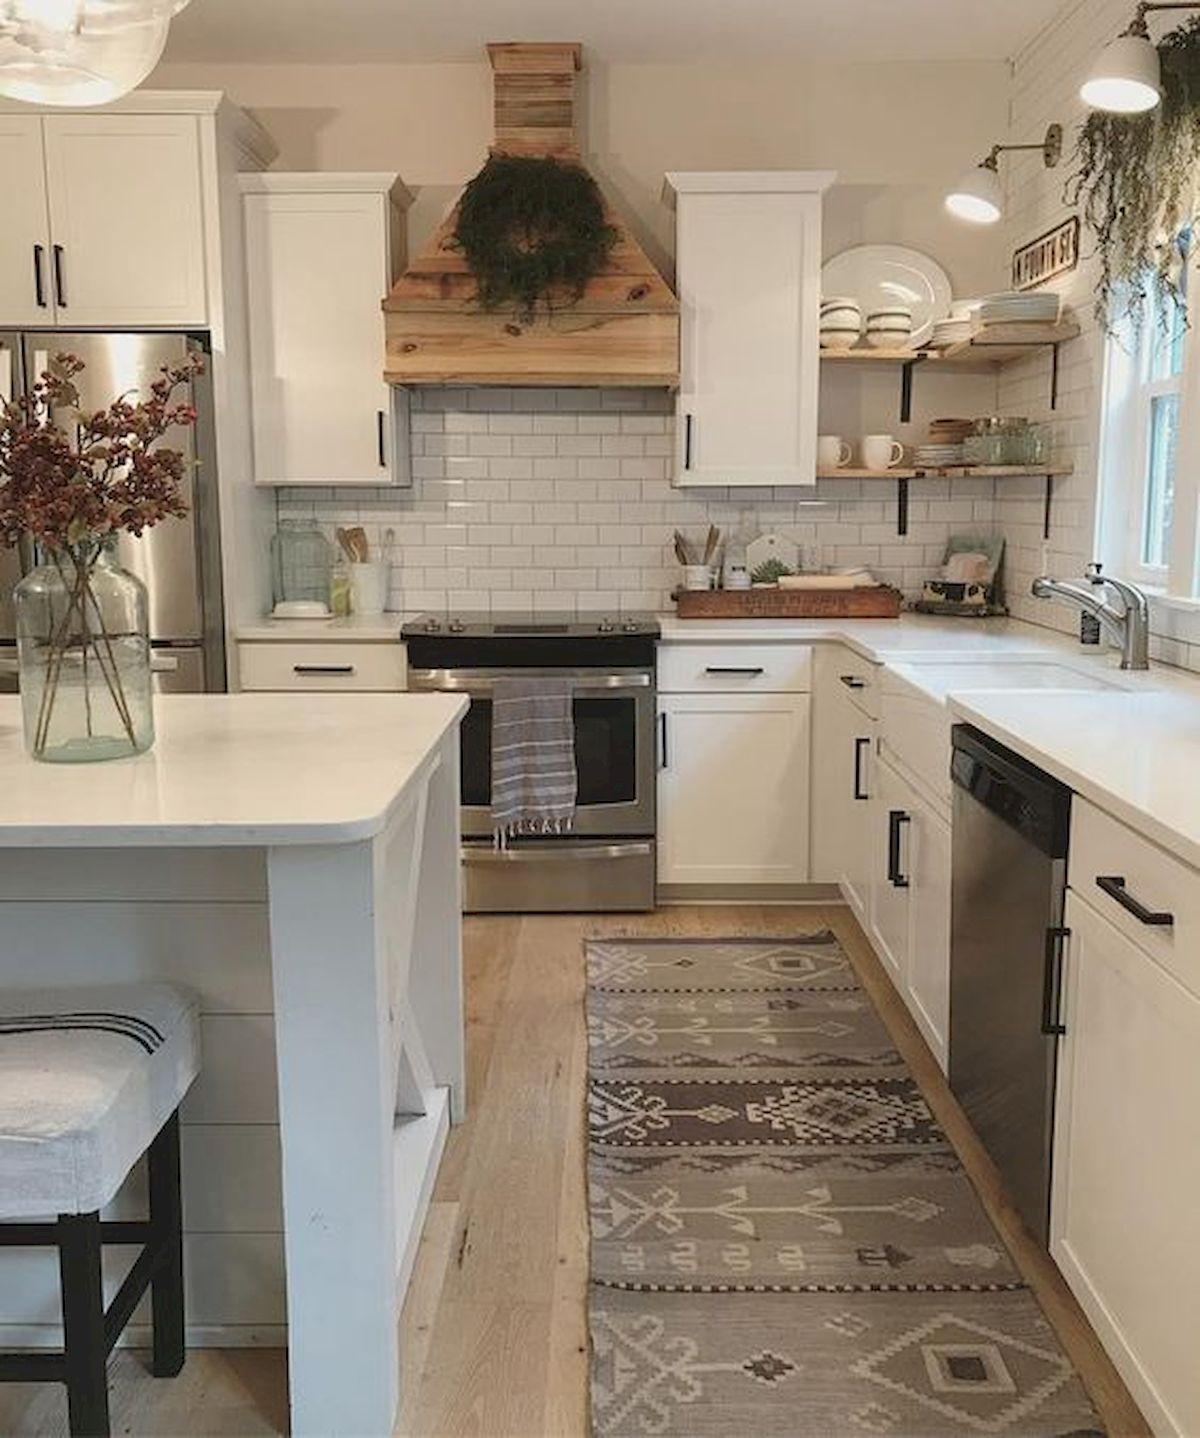 60 great farmhouse kitchen countertops design ideas and decor 35 home decor kitchen kitchen on farmhouse kitchen decor countertop id=49194